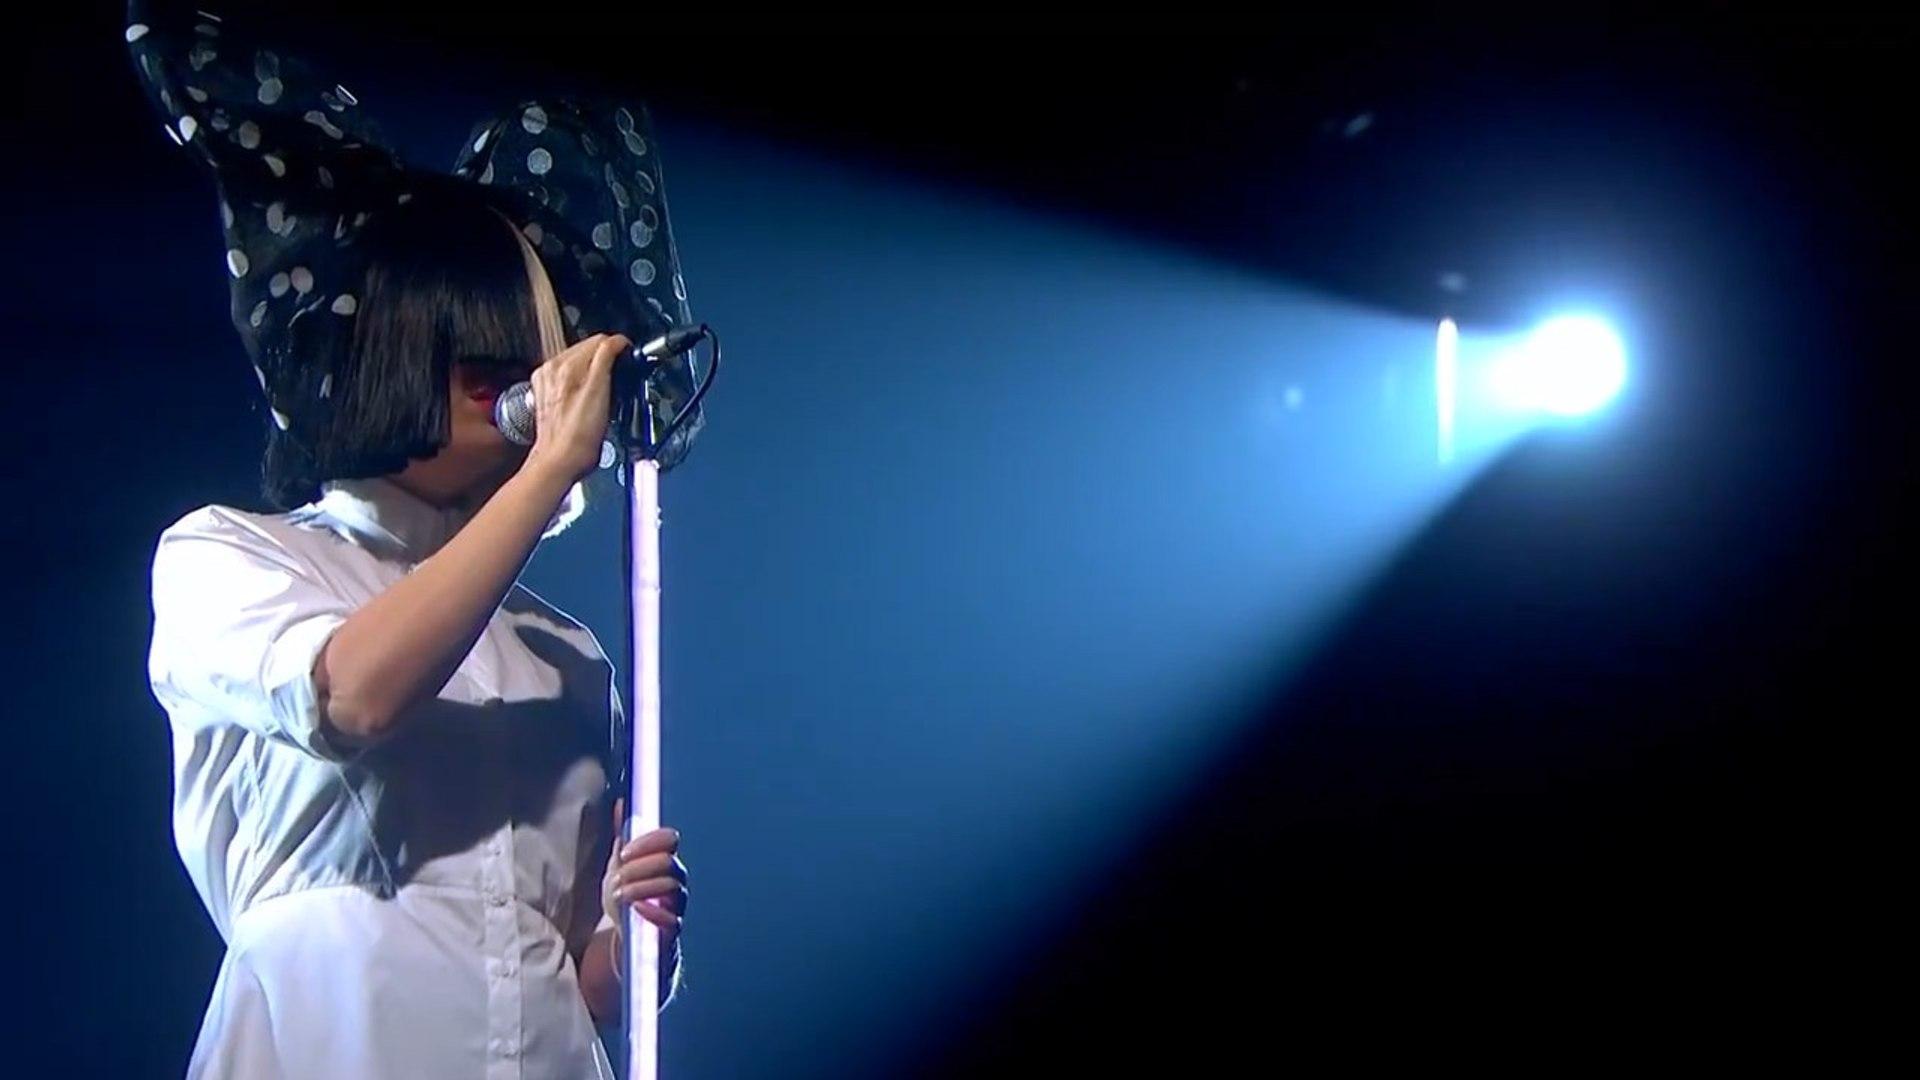 Sia - Alive - Live The X Factor UK - 06/DEC/2015 720p